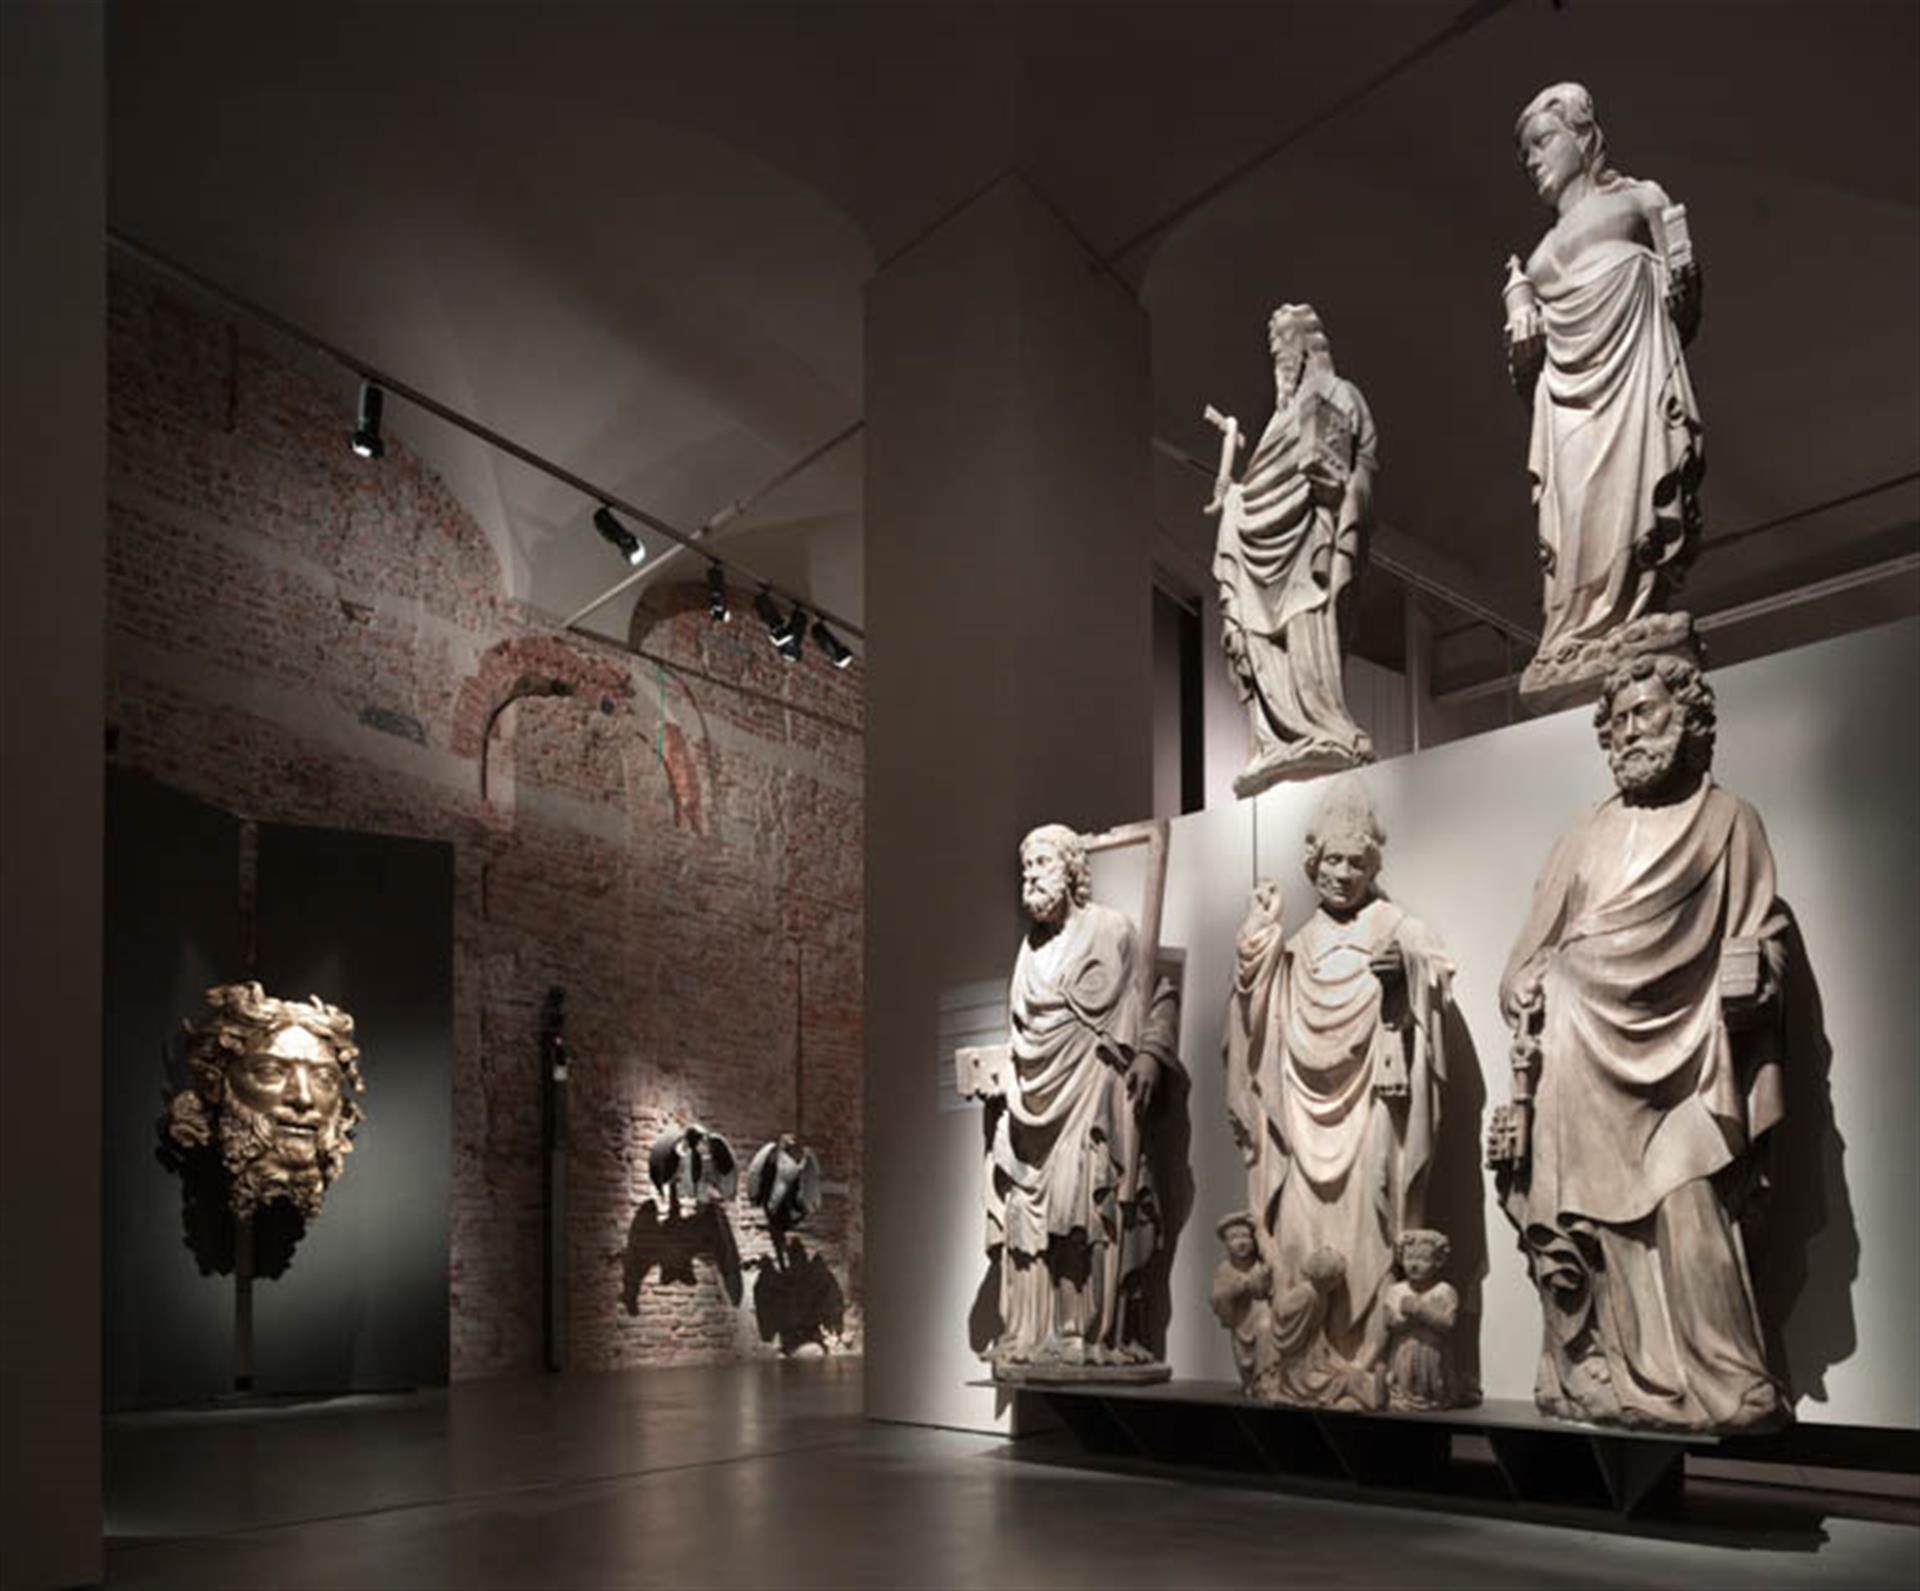 39 Museo Duomo MI 2 5Dic2013 (FC0110 008882) © Francesco Castagna